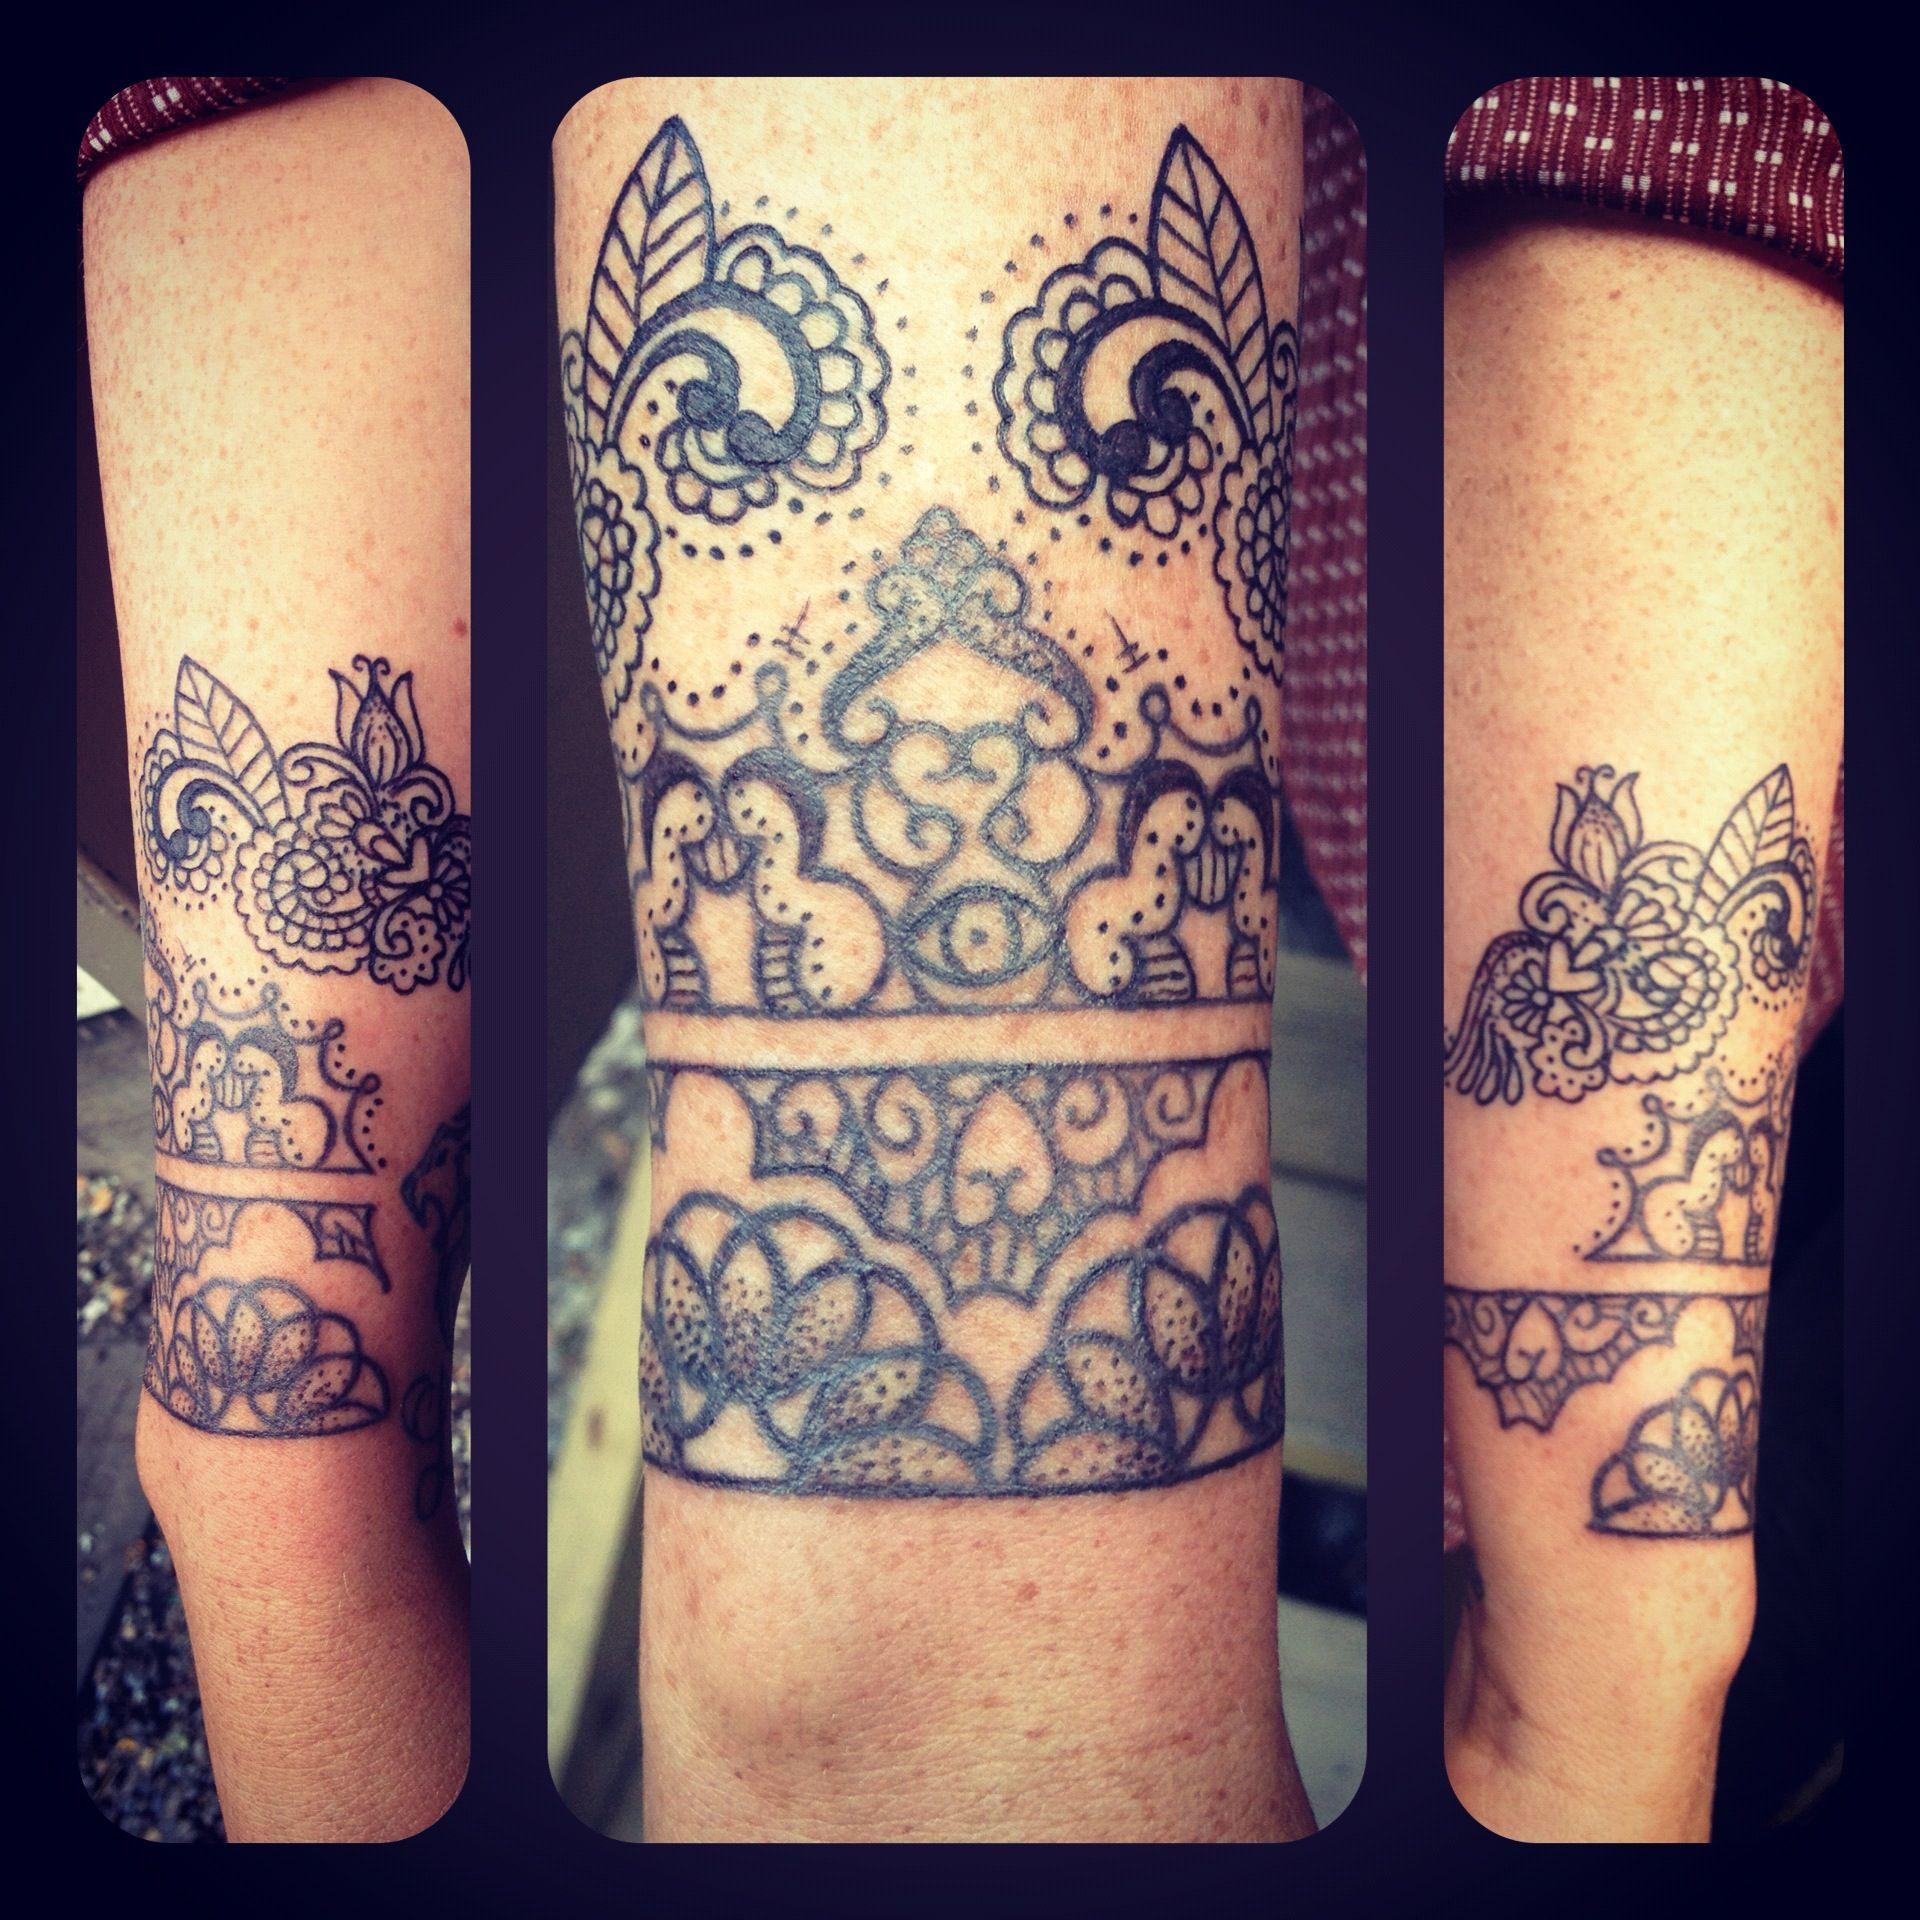 Tatuajes Mehndi Hombro : Más de ideas increíbles sobre tatuajes inspirados en